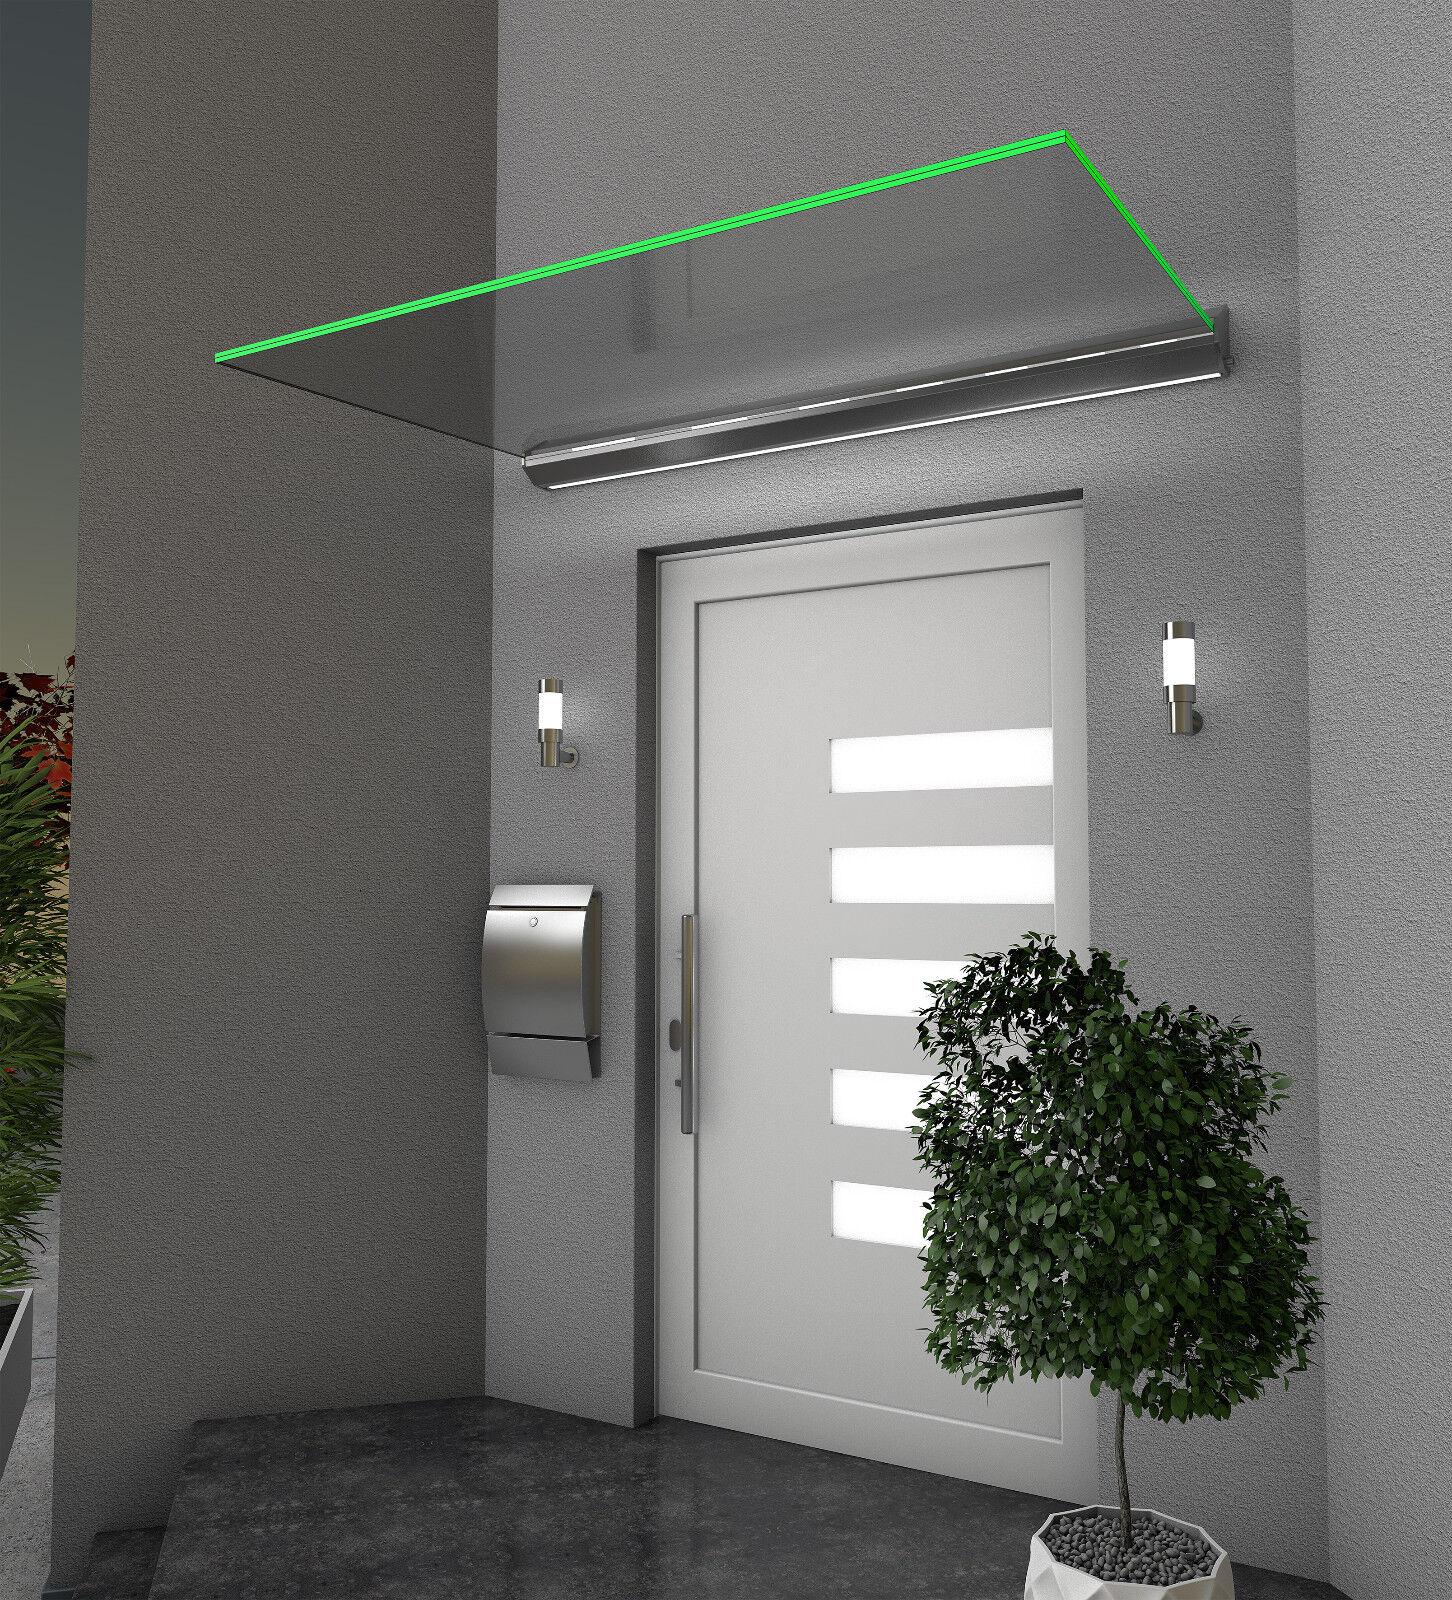 Gutta Echtglasvordach HD LED - Haustürvordach 160 x 100 cm mit LED-Beleuchtung